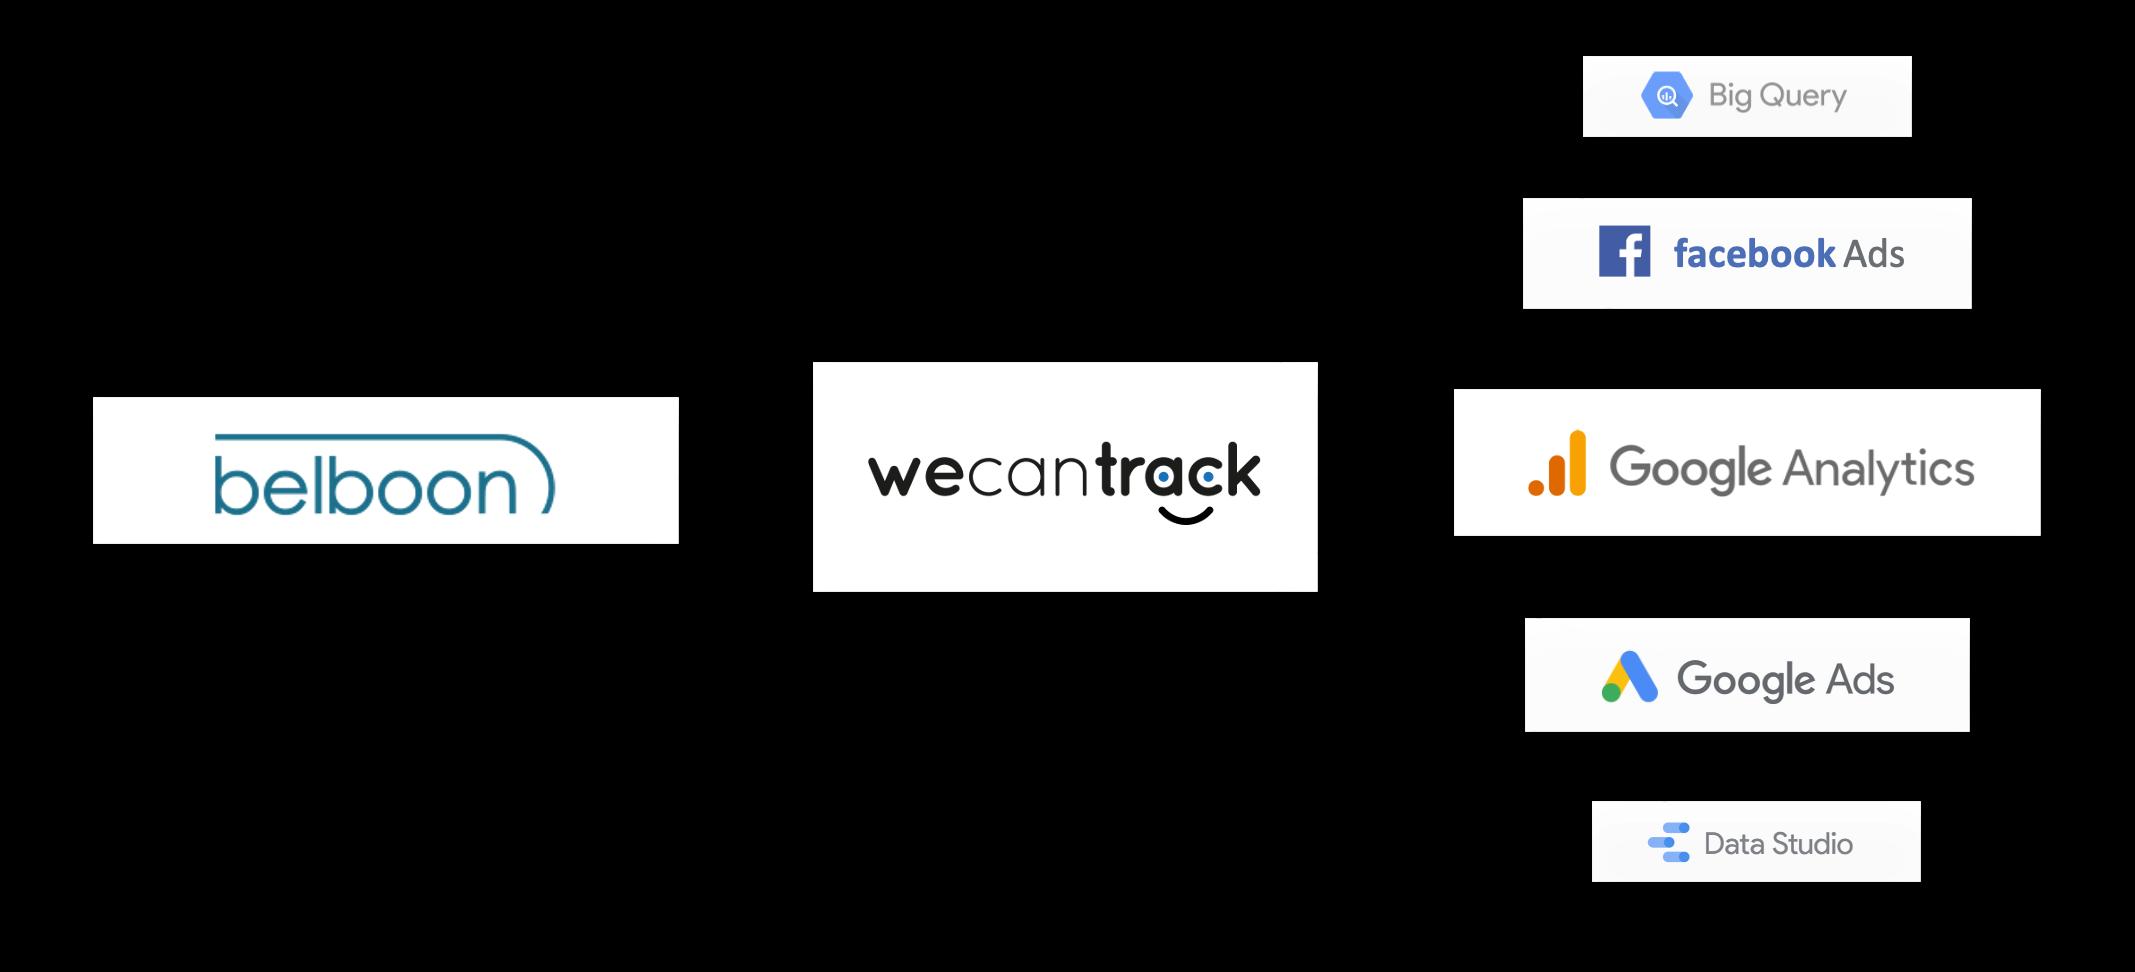 belboon-affiliate-conversions-tracking-via-api